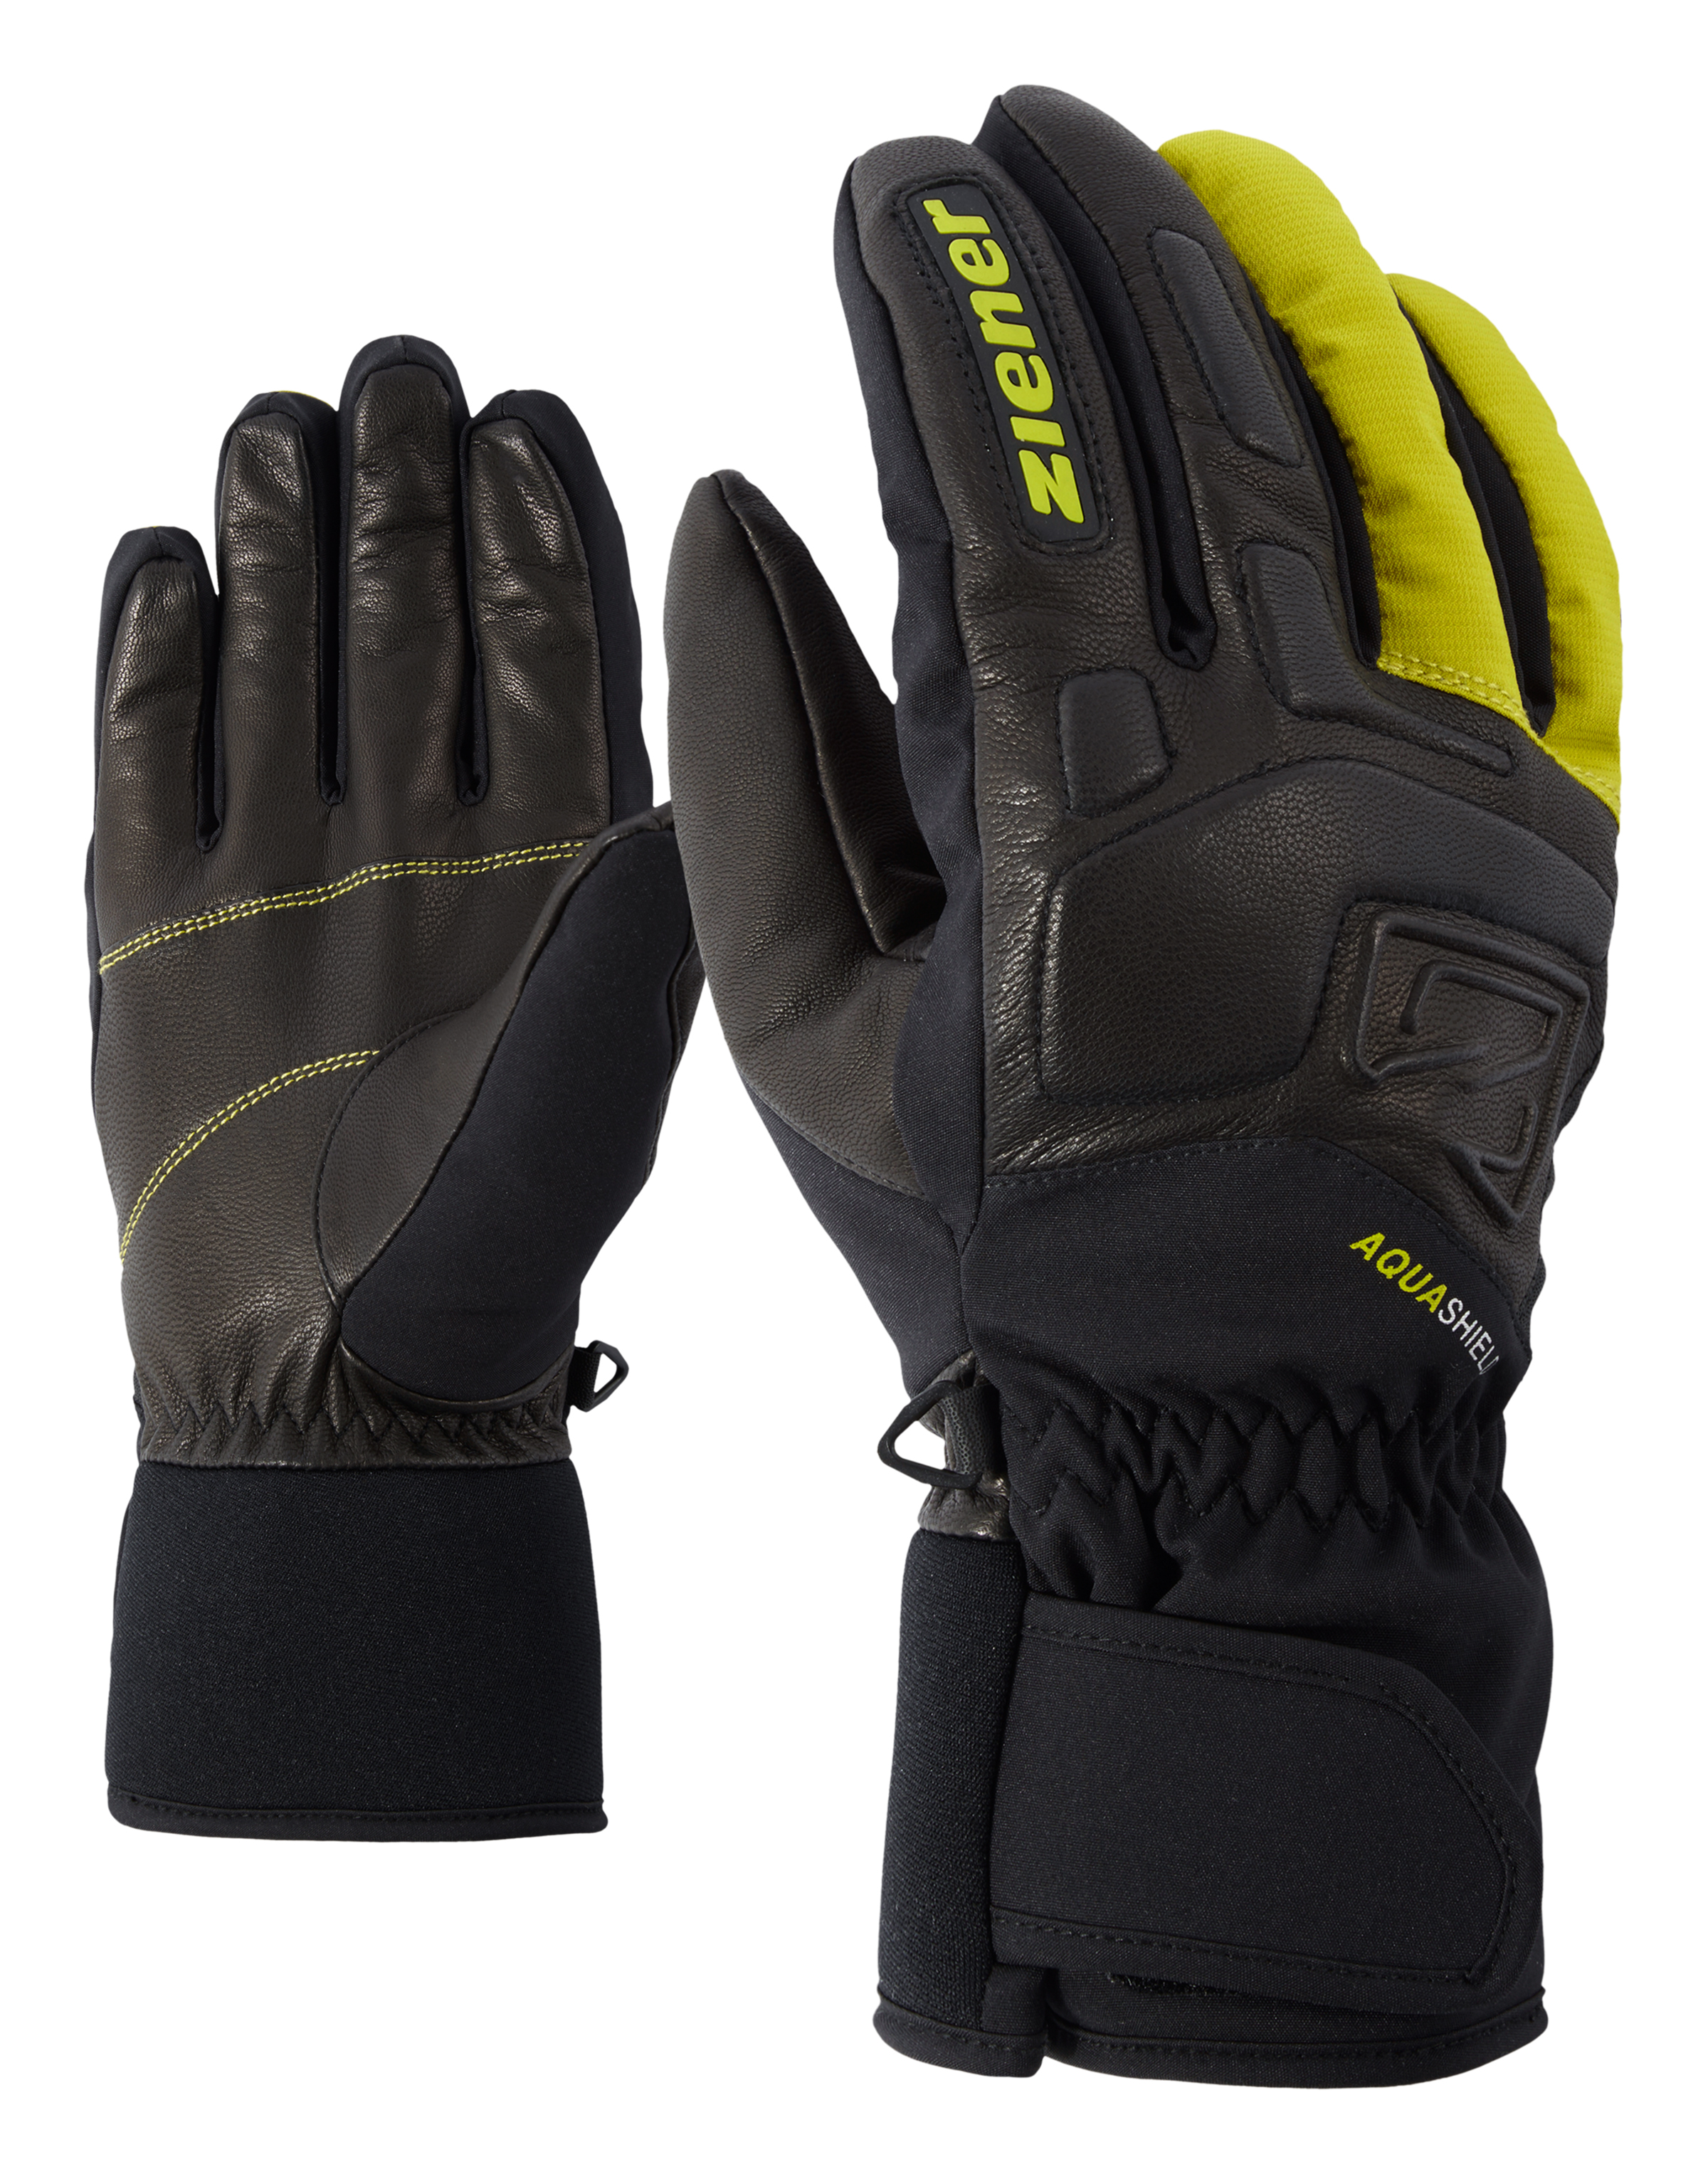 Ziener GLYXUS AS®, moške smučarske rokavice, rumena